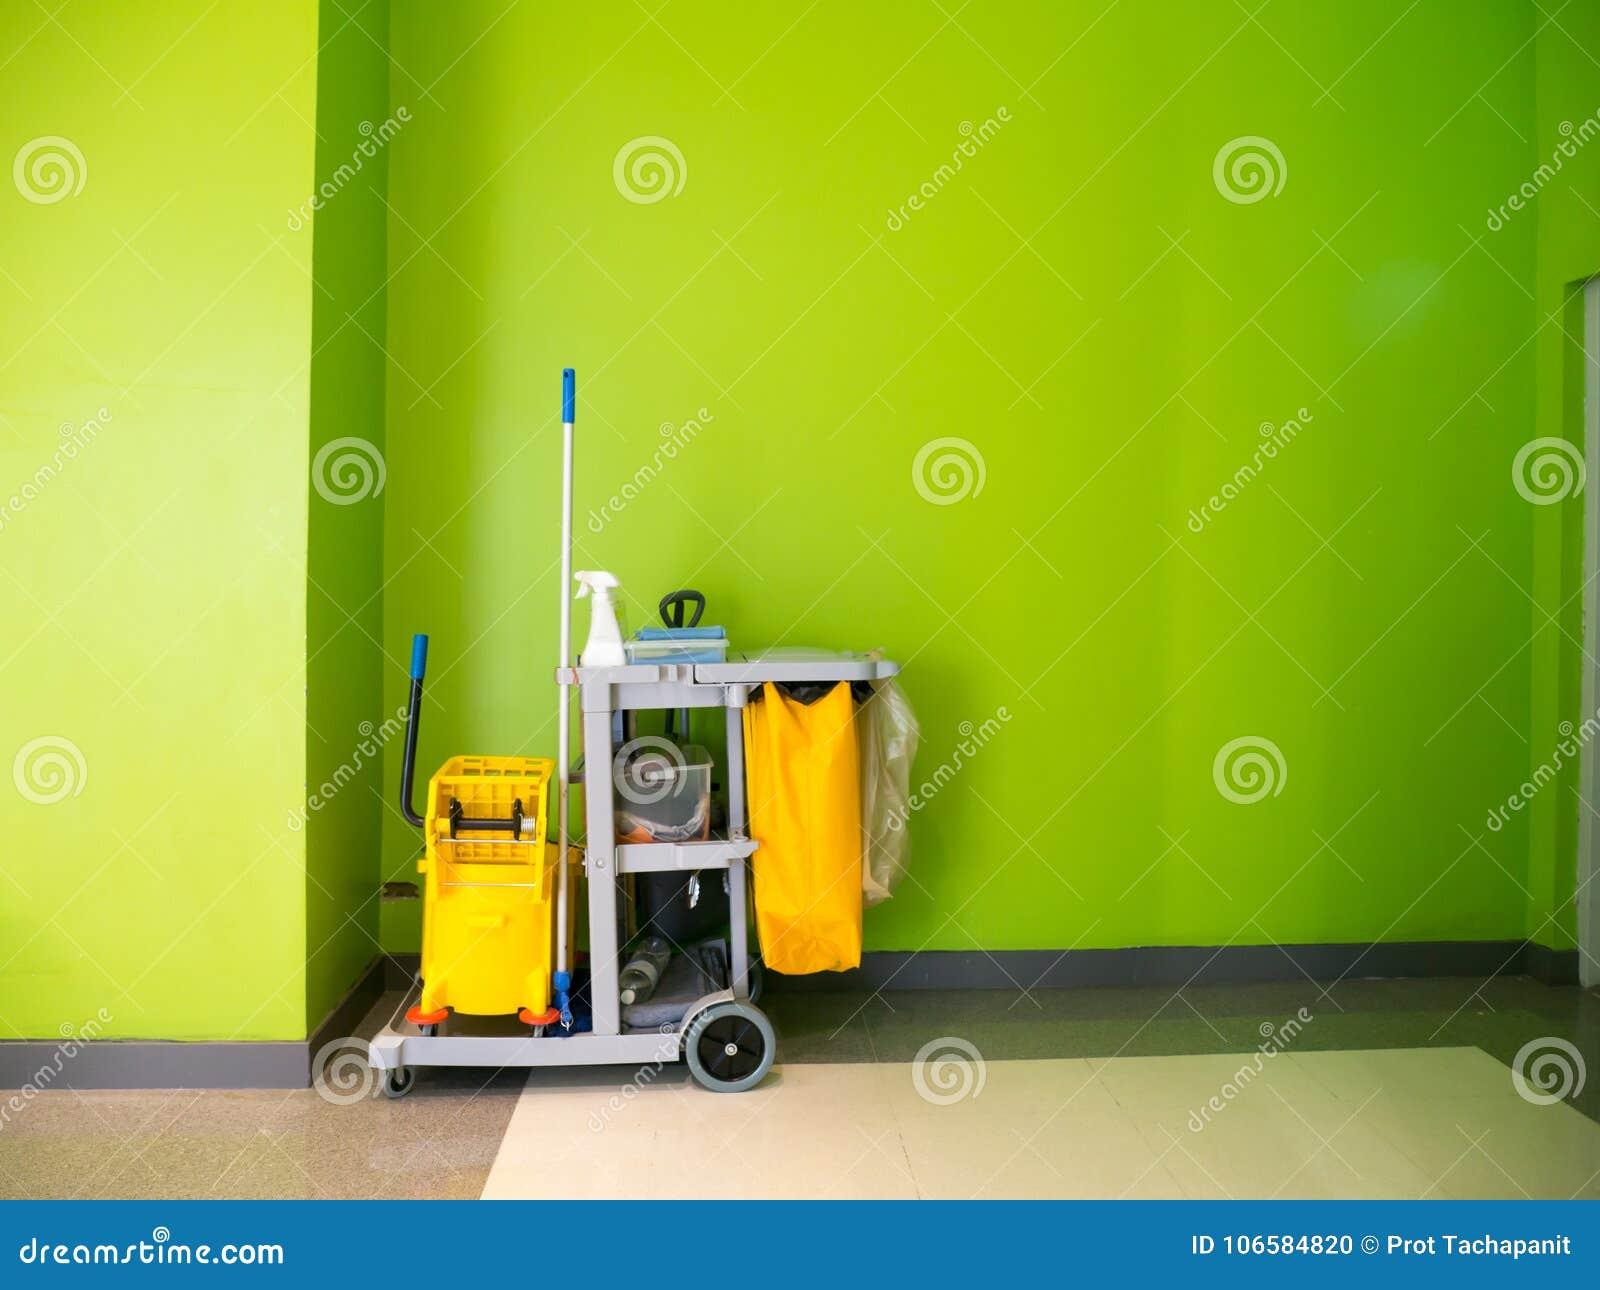 Espera do carro das ferramentas da limpeza para limpar Cubeta e grupo de equipamento da limpeza no escritório